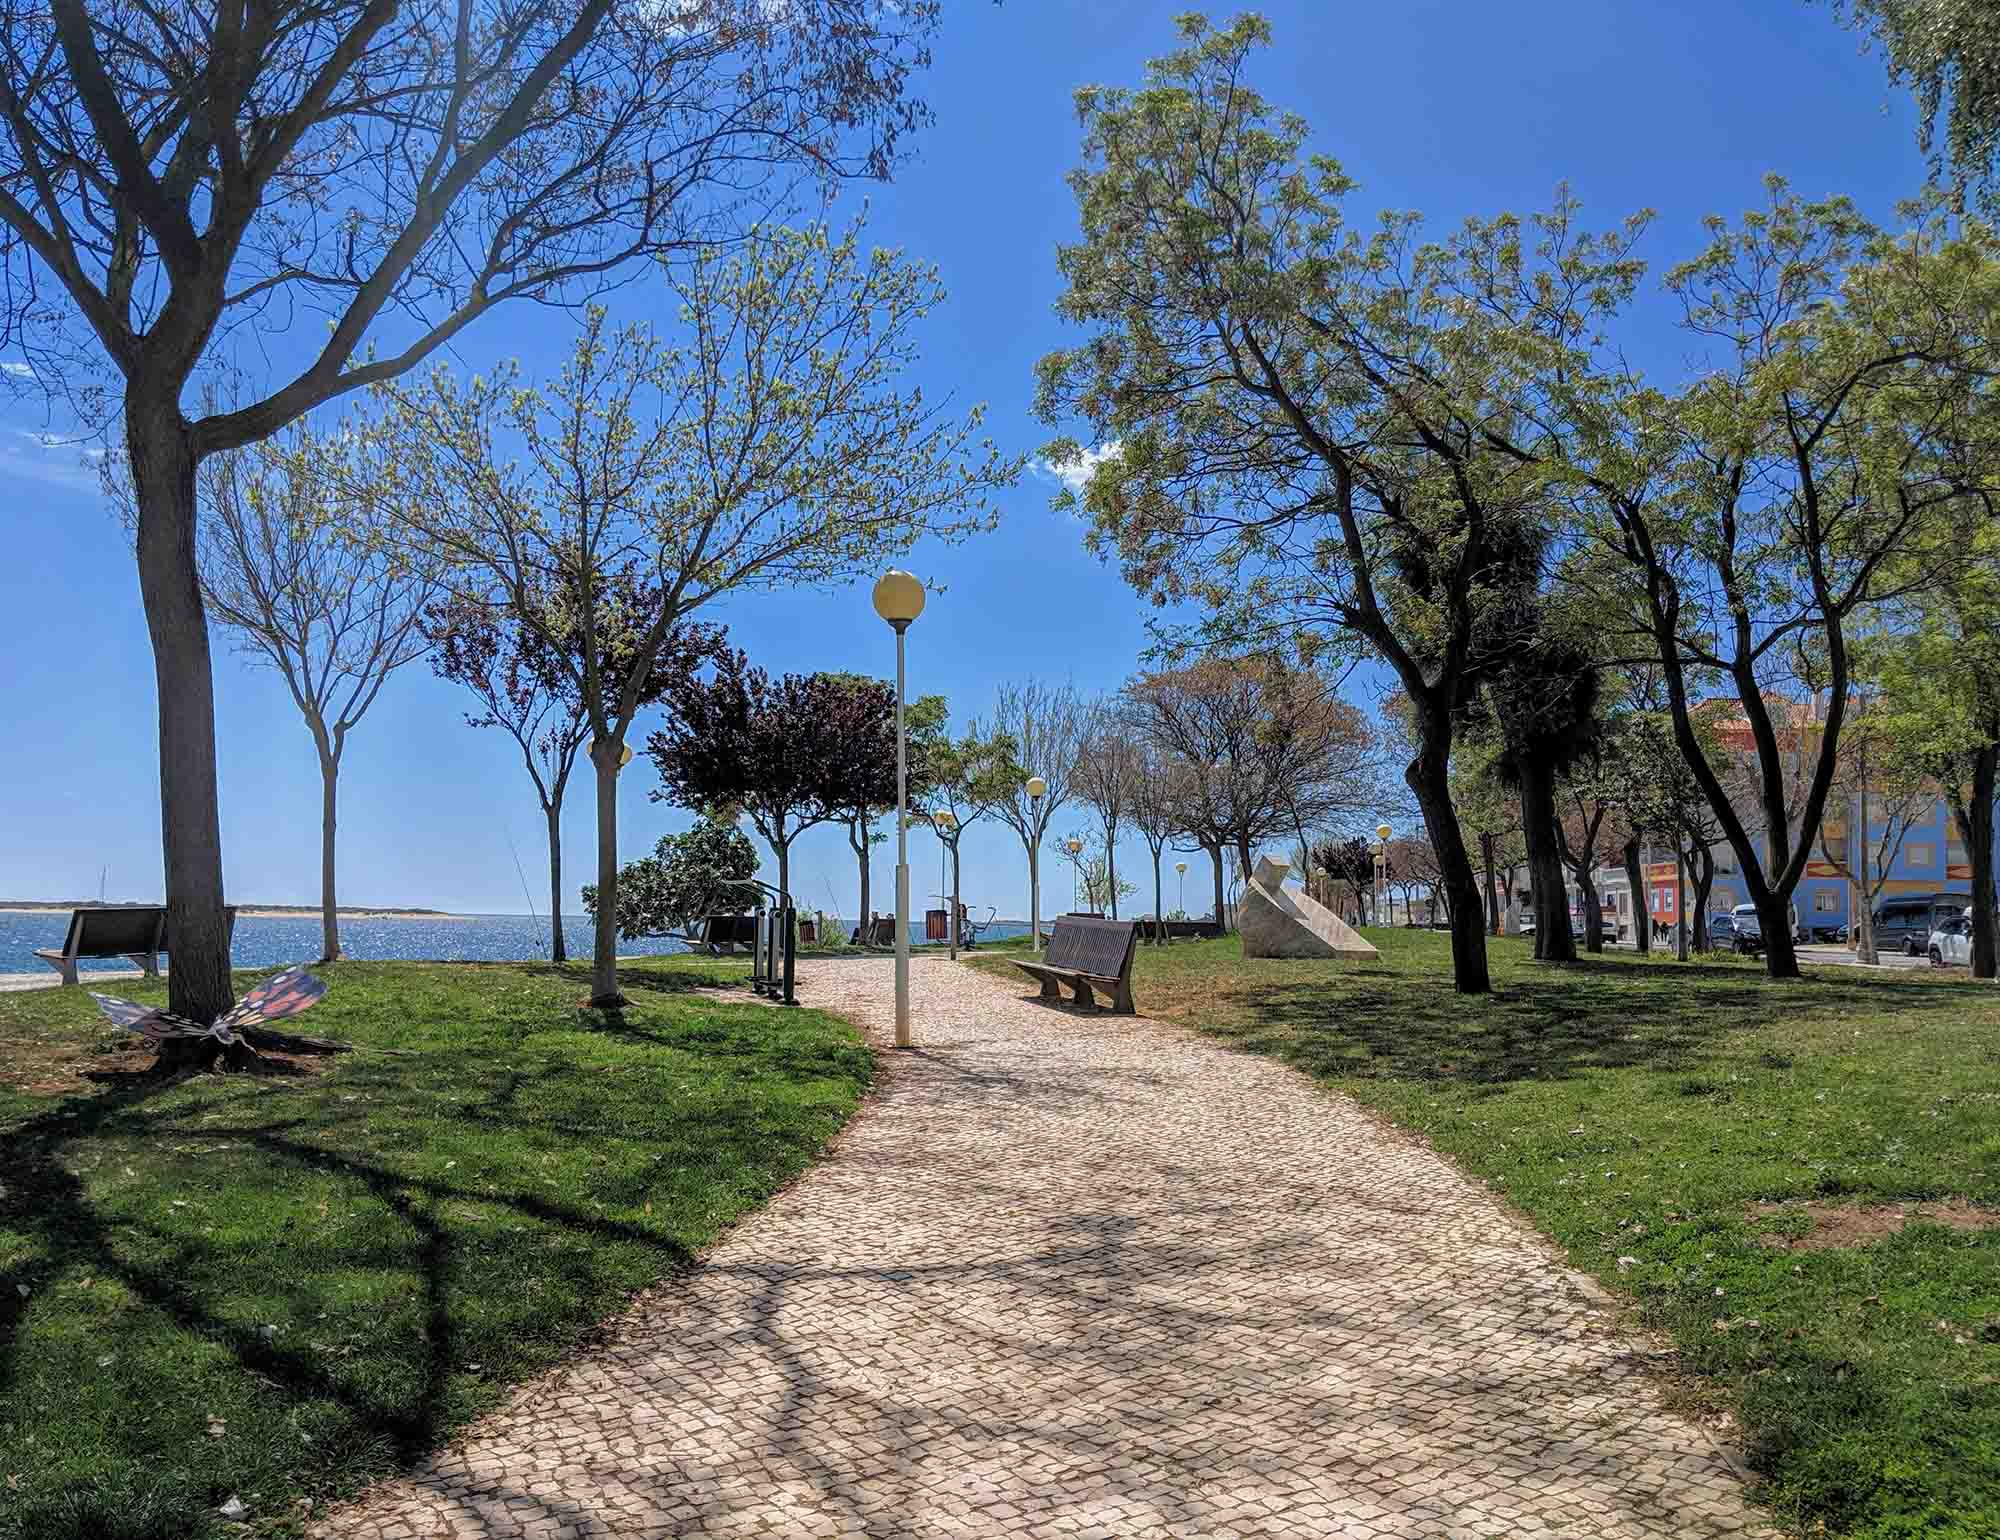 vila real de santo antonio park promenade